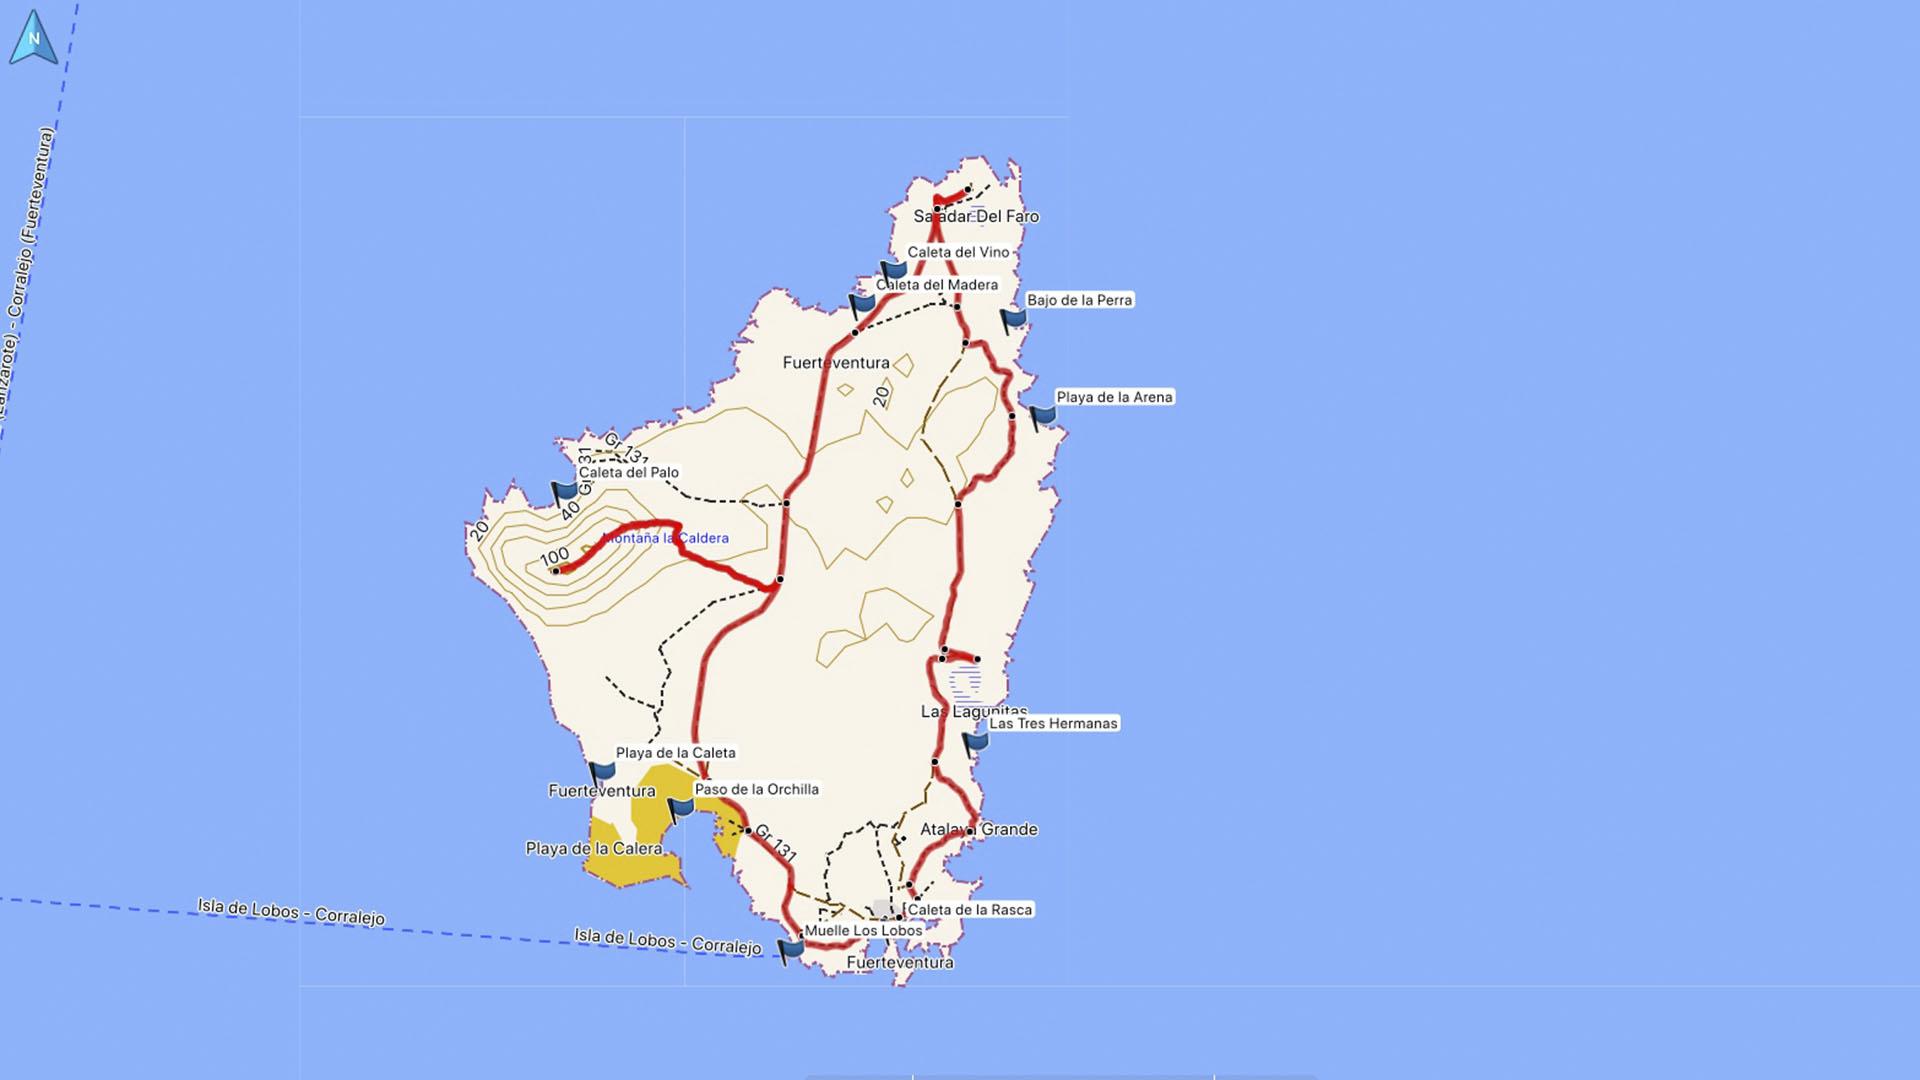 Fuerteventura Karte der Straende: Die Insel Ilsa de Lobos.